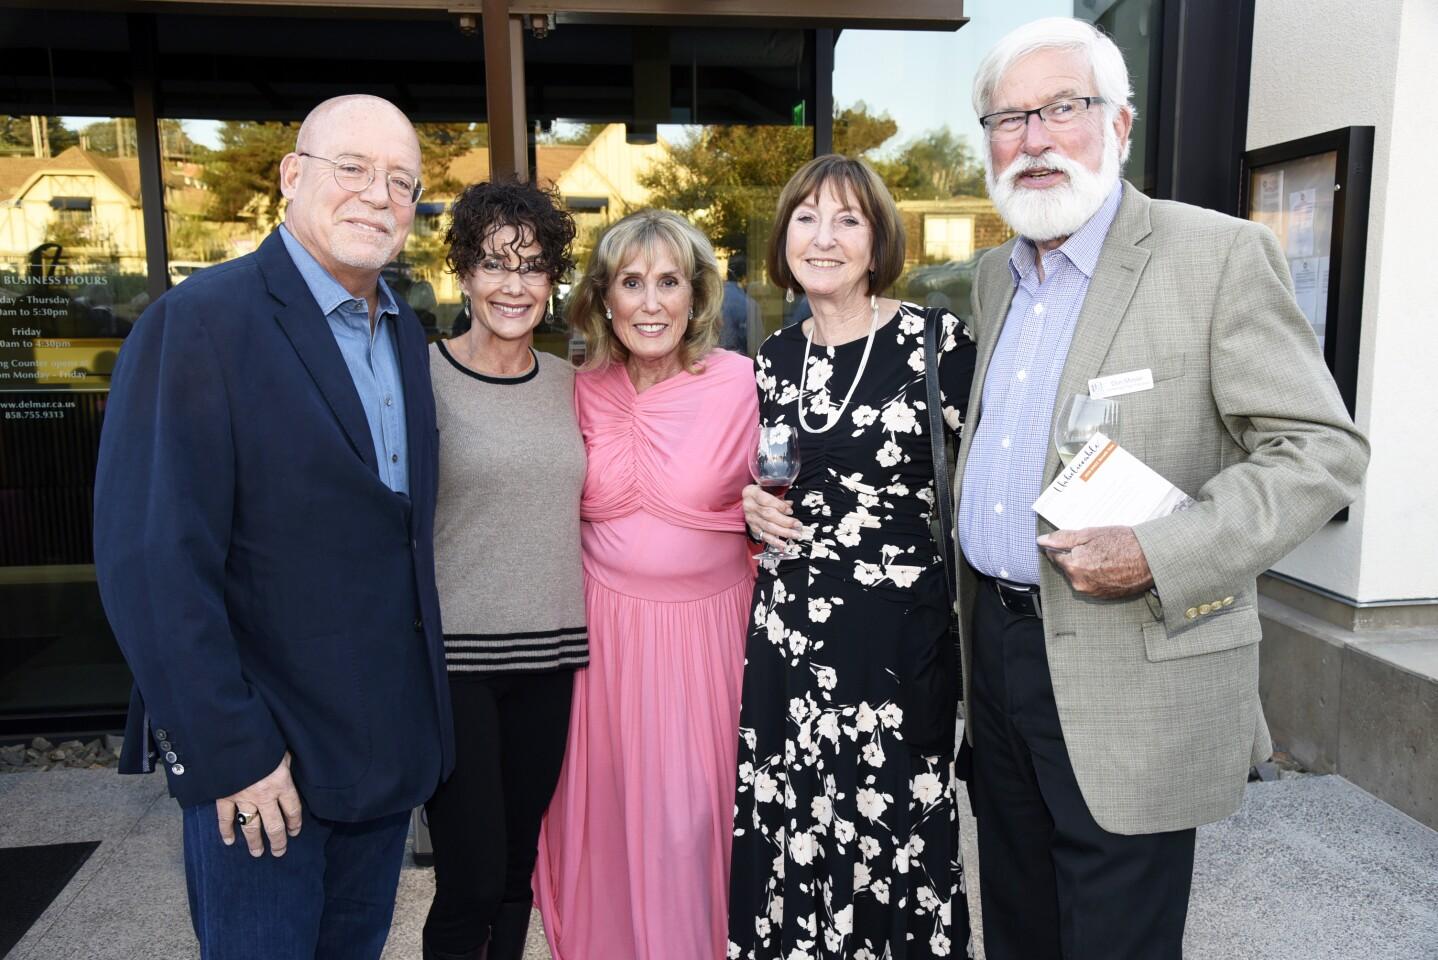 Jim and Lynne McMenamin, Rosanne Holliday, Ann Feeney, DMCC Past President Don Moser